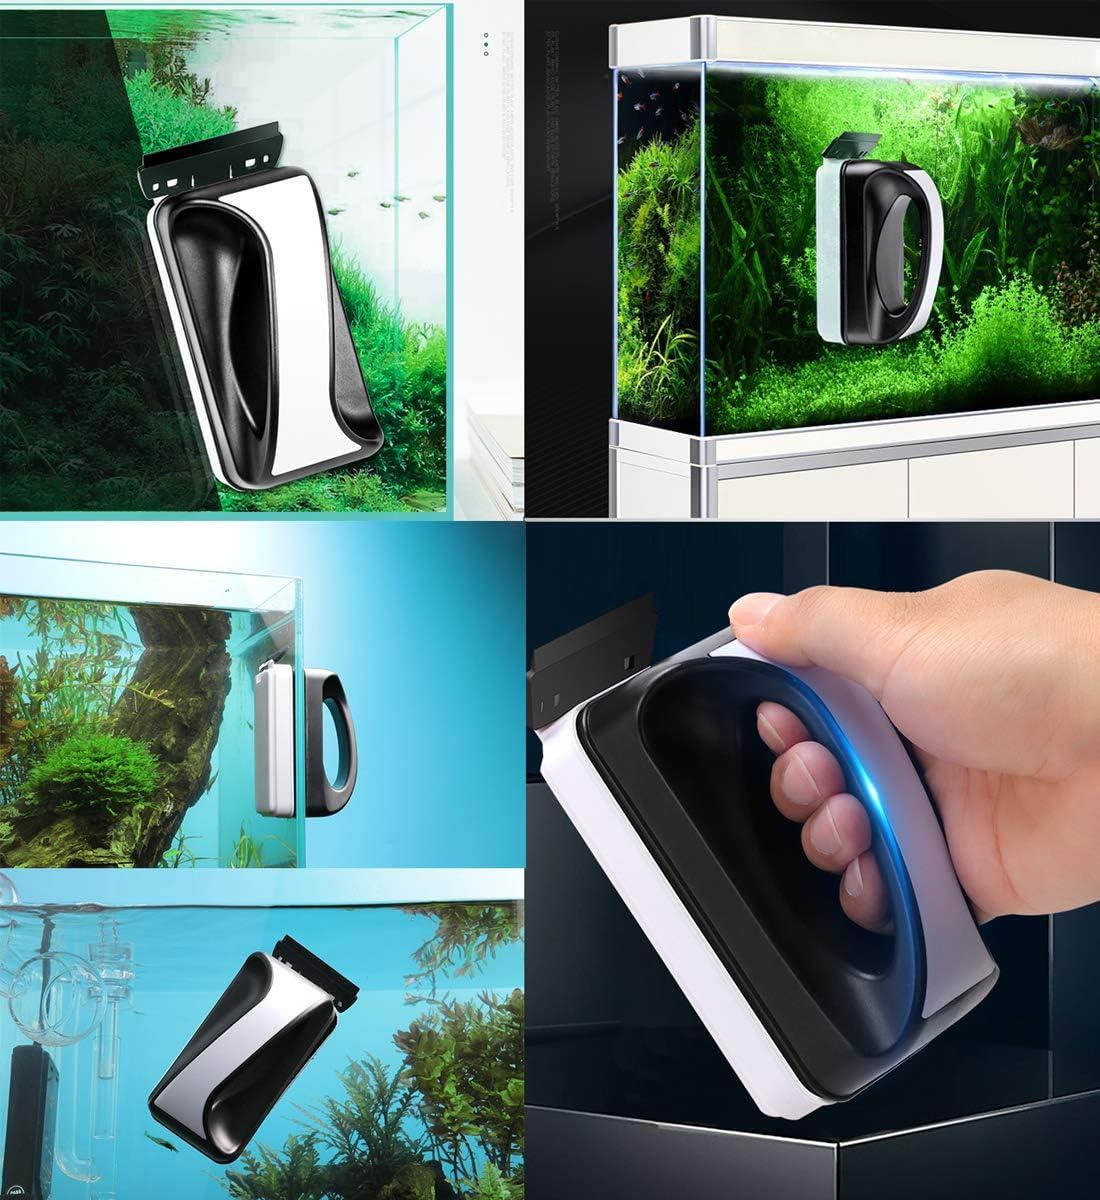 wecan Magnetic Fishbowl Glass Cleaner Floating Cleaning Brush Acrylic Safe Algae Scraper Medium Size